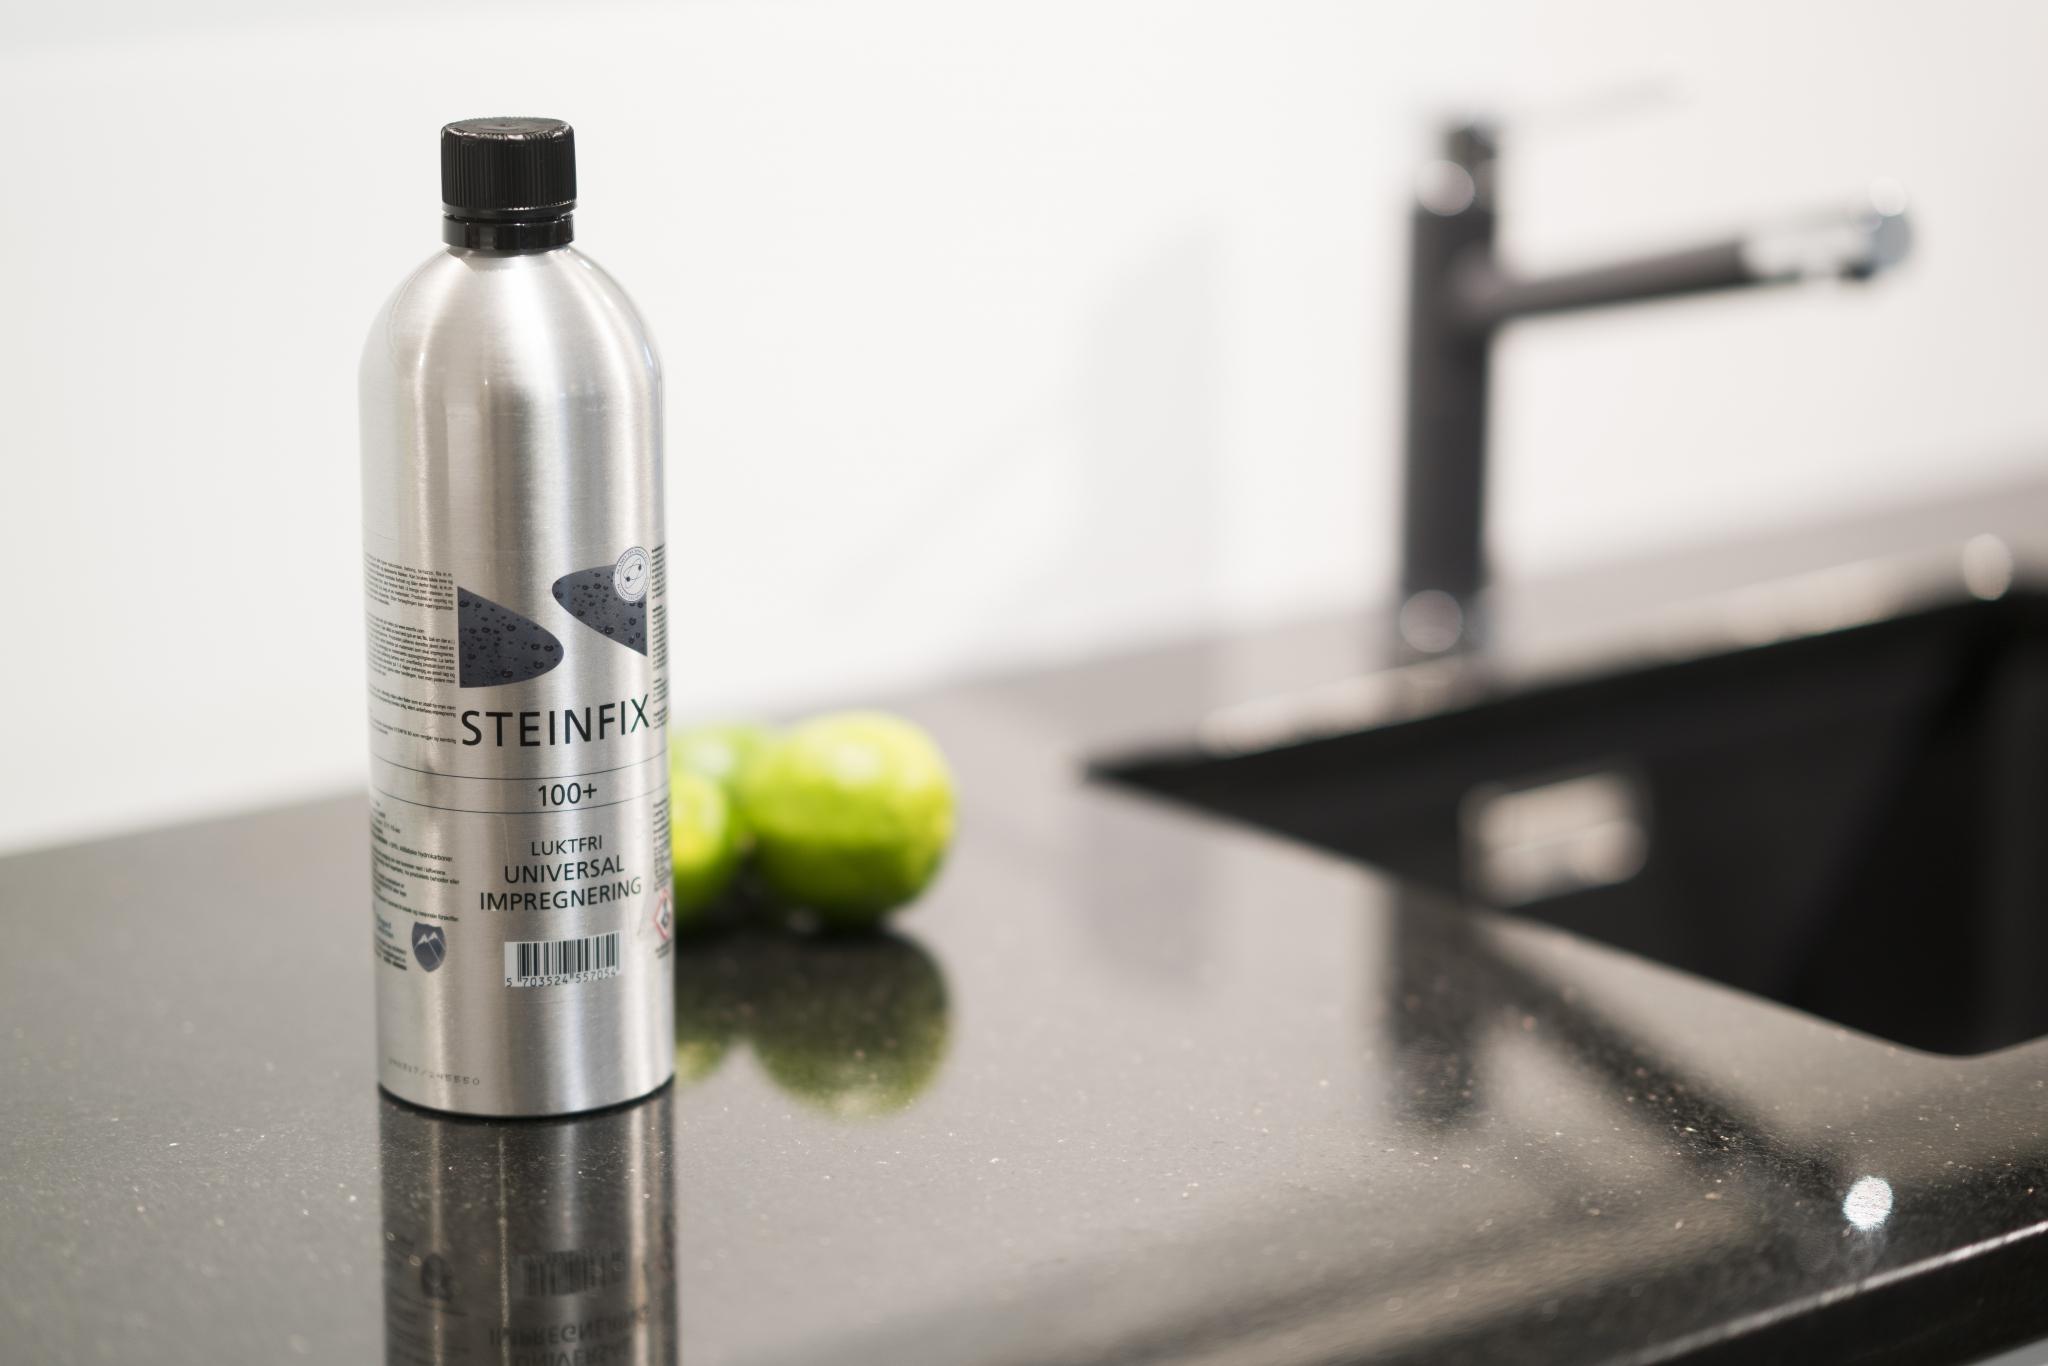 Steinfix 100+ flaske stående på benkeplate. Foto.